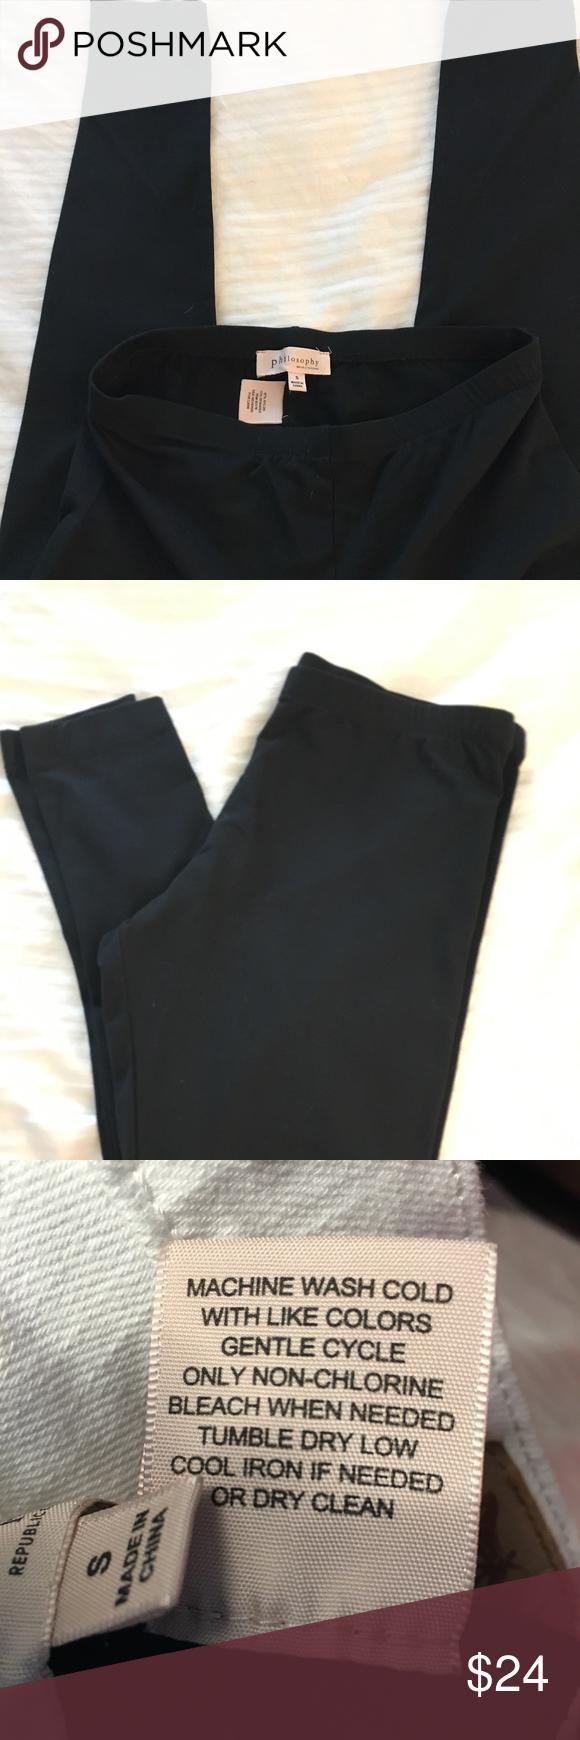 Philosophy Leggings Never Worn Worn Clothes Design Pants For Women